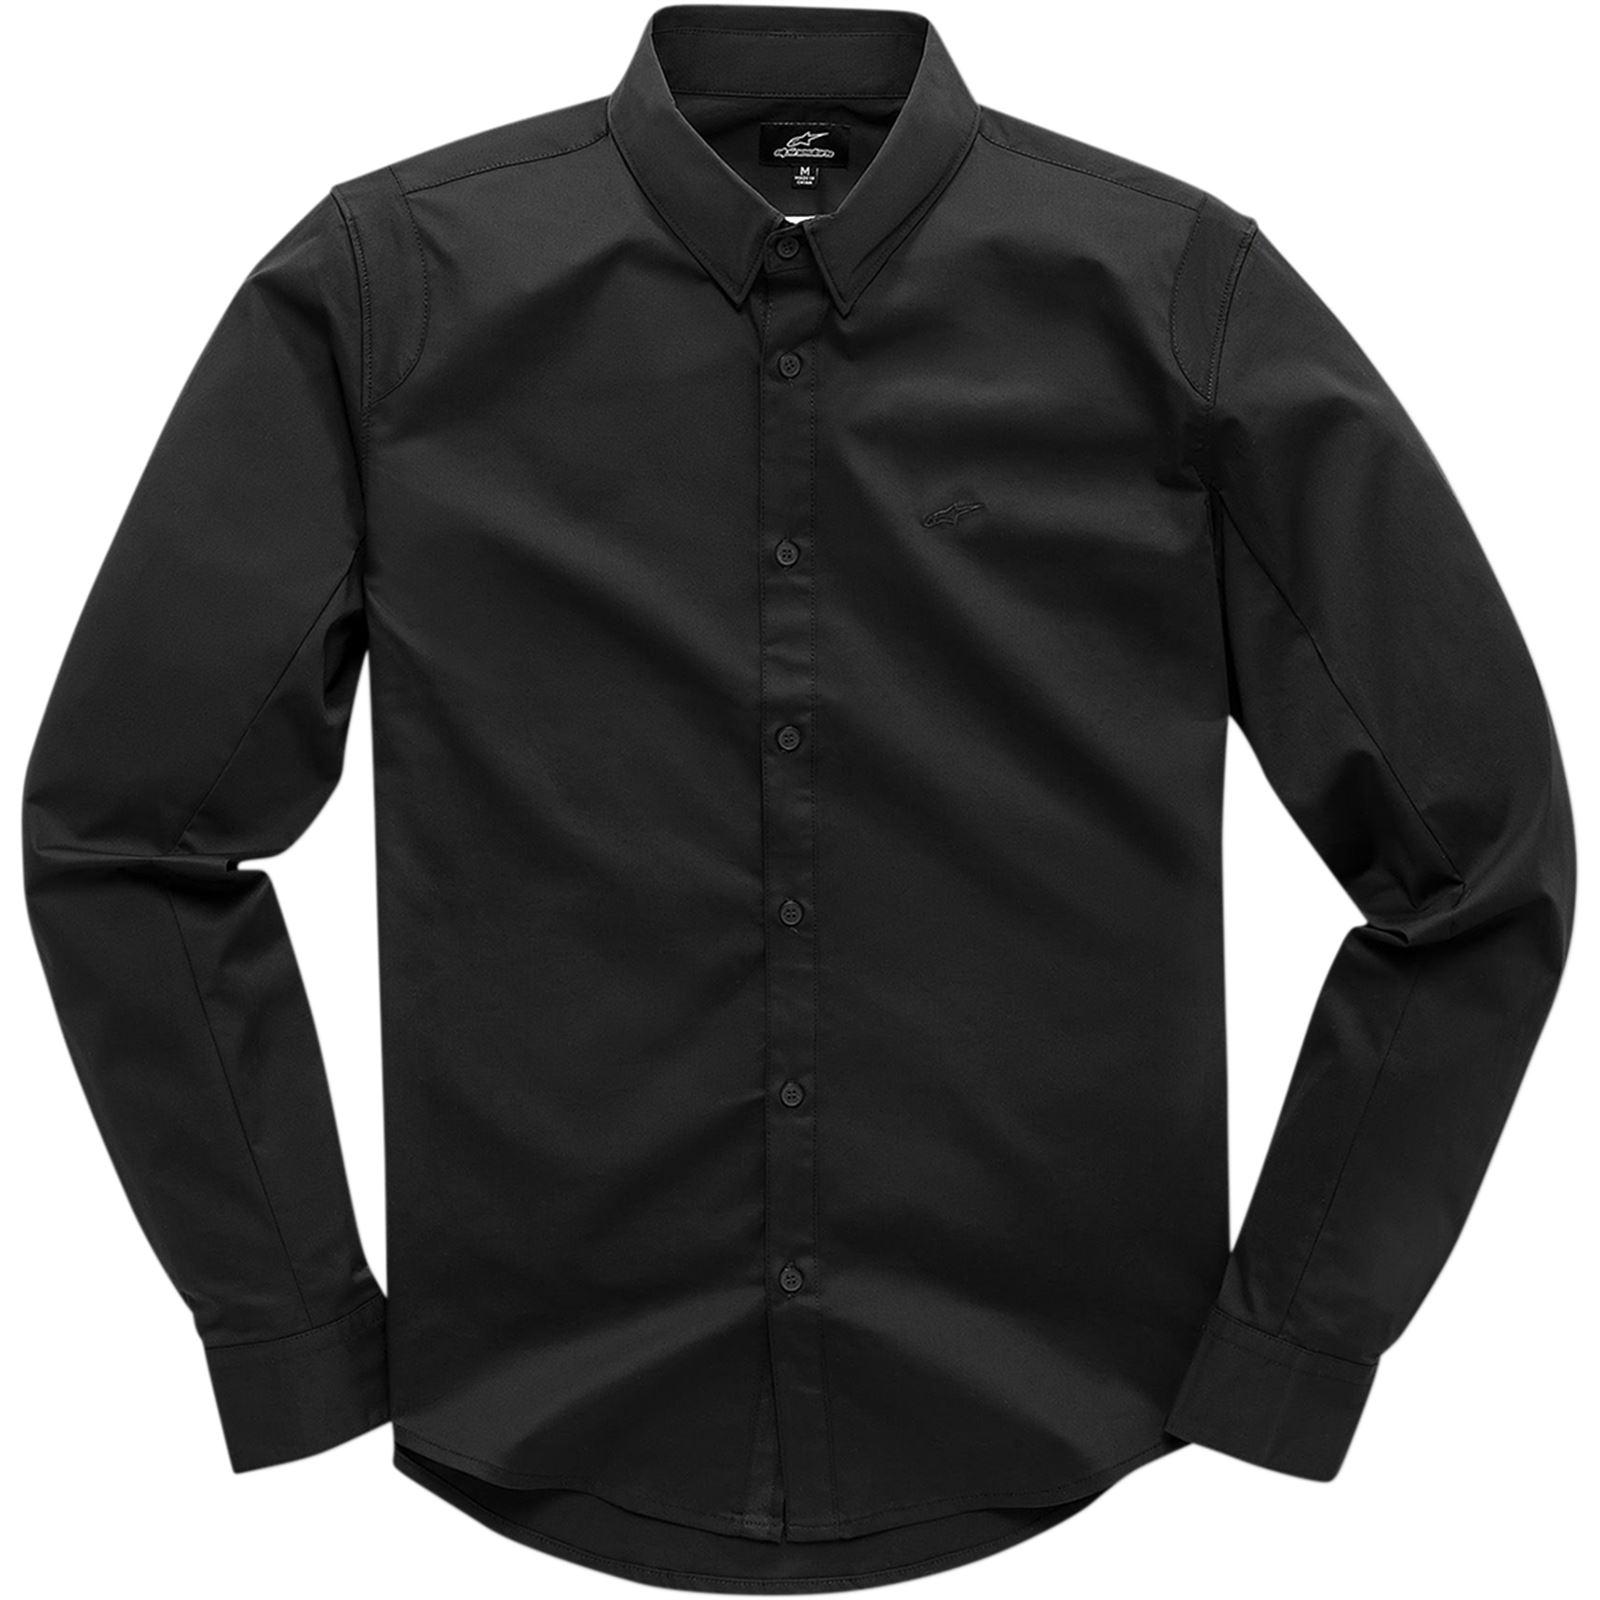 Alpinestars Ambition II Shirt - Black - Medium